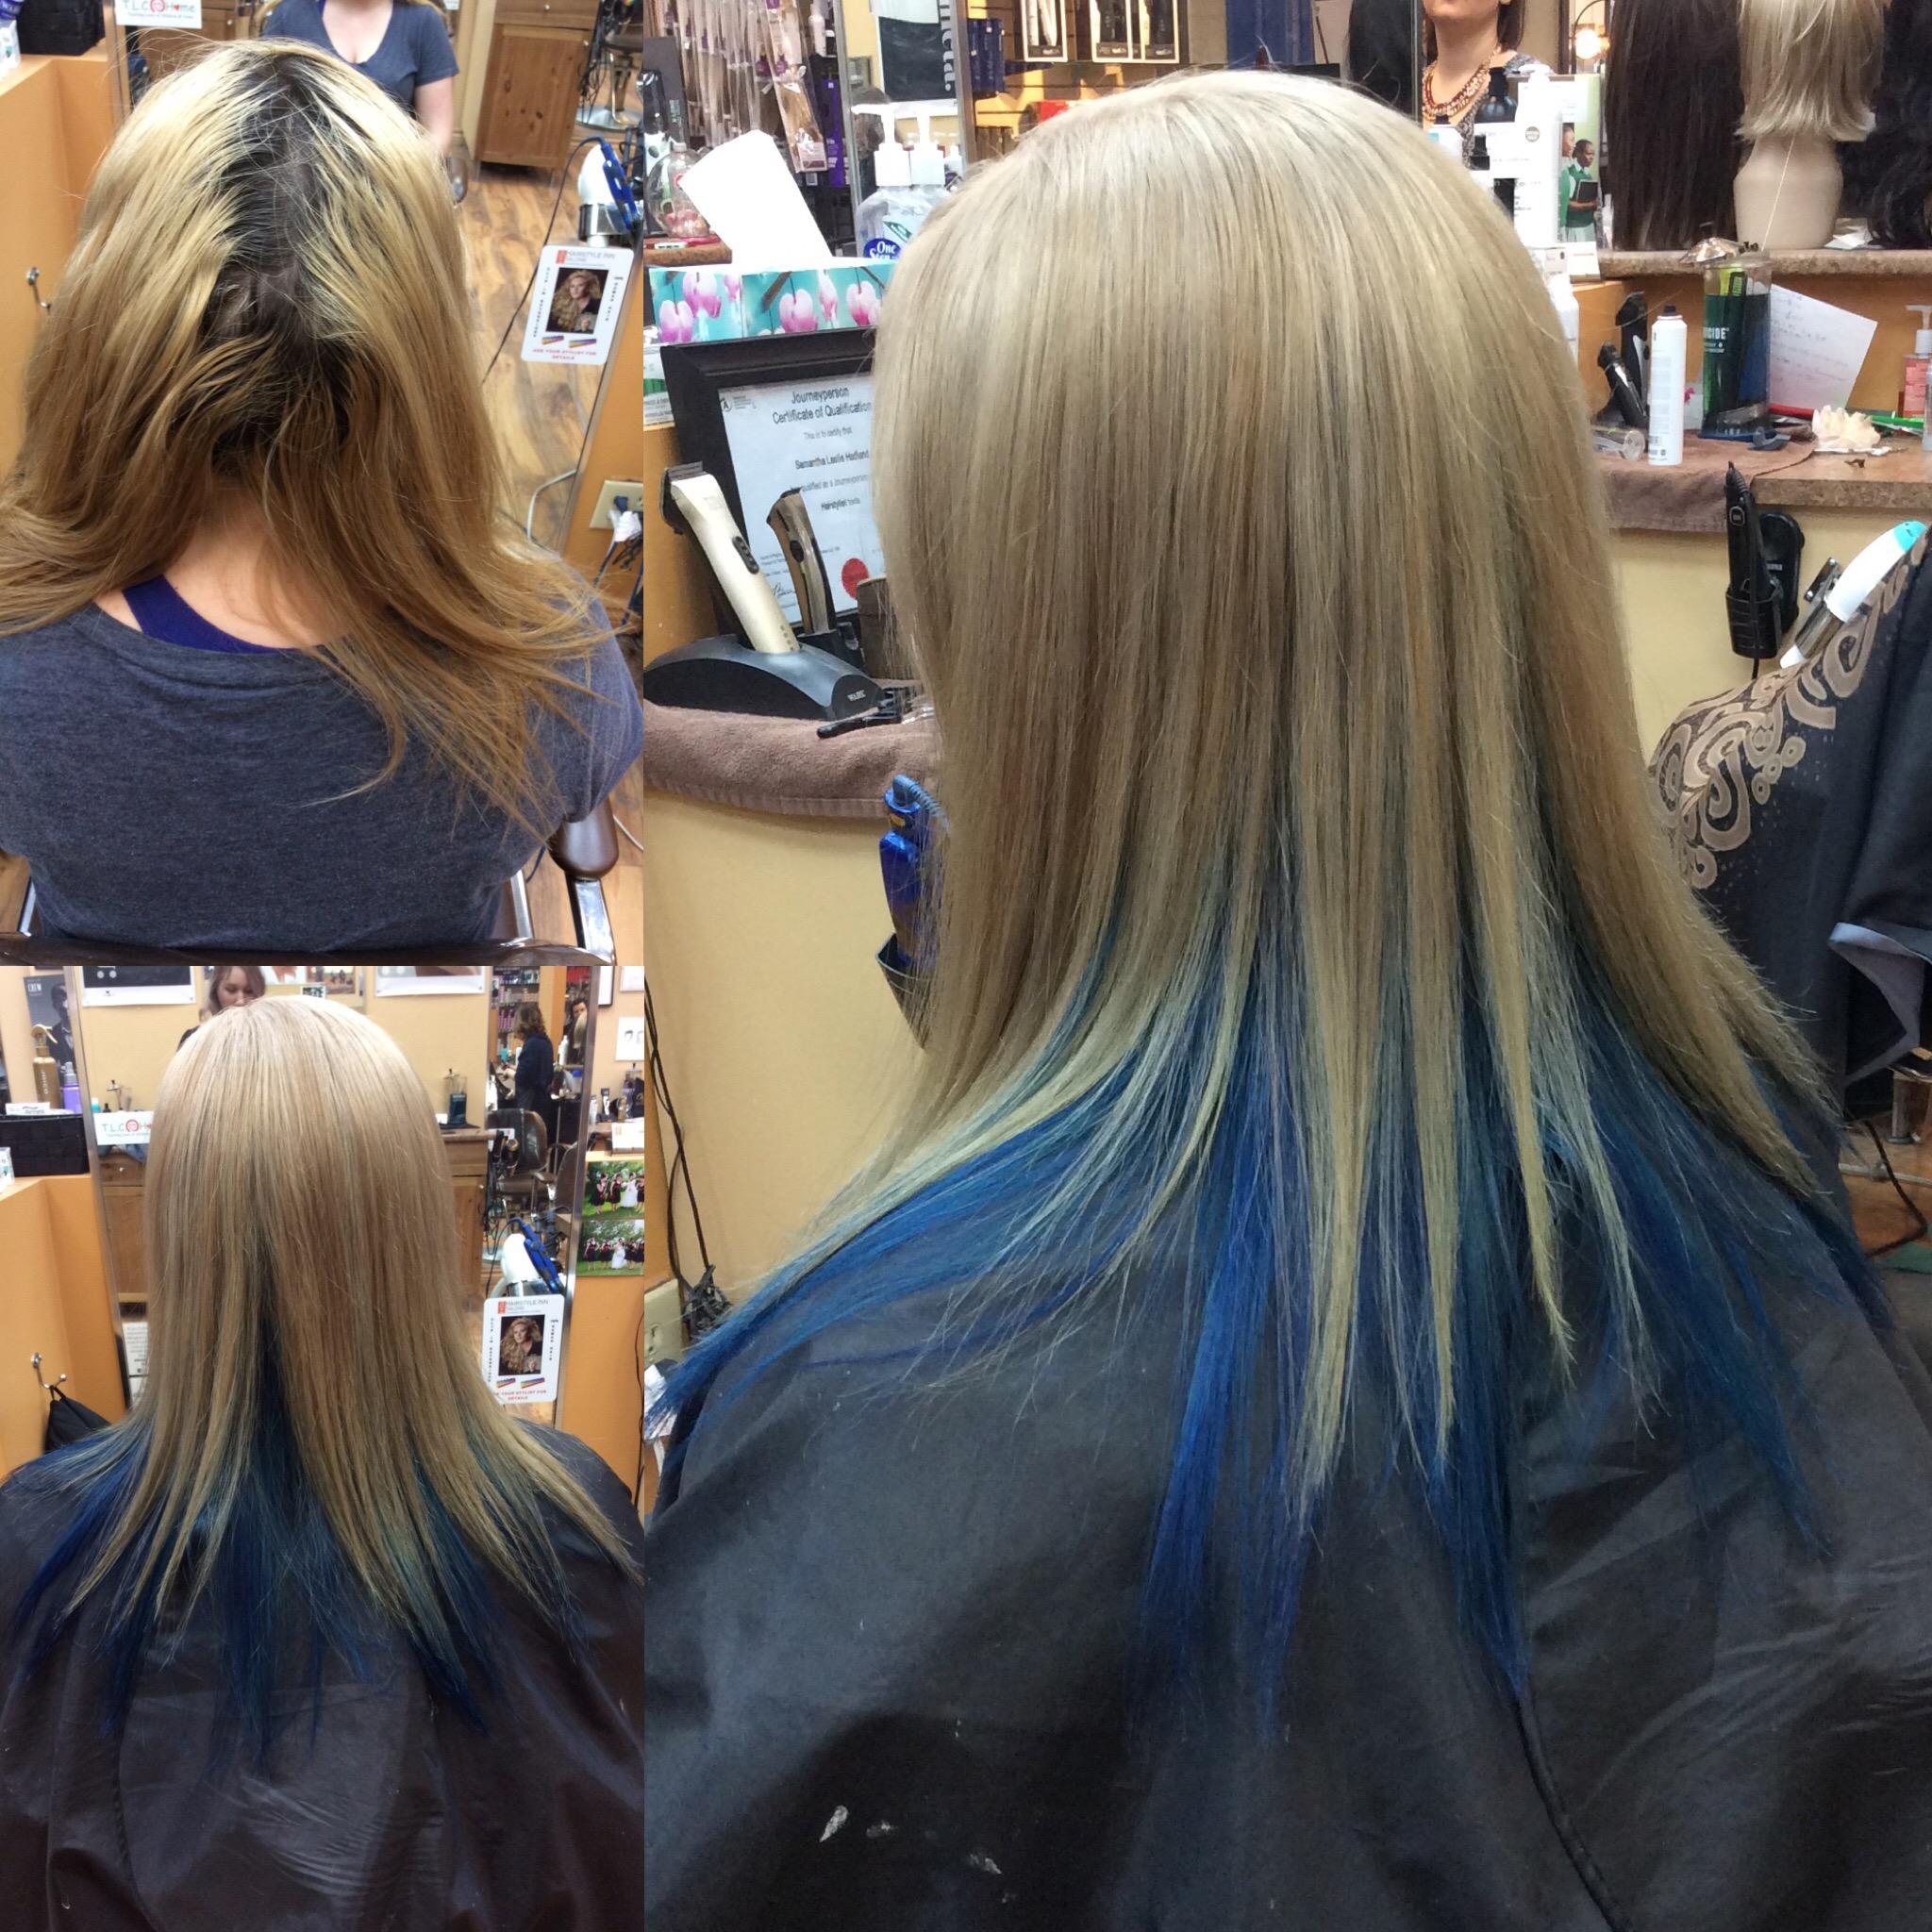 Female customer with transformed hair at hairstyle inn saskatoon